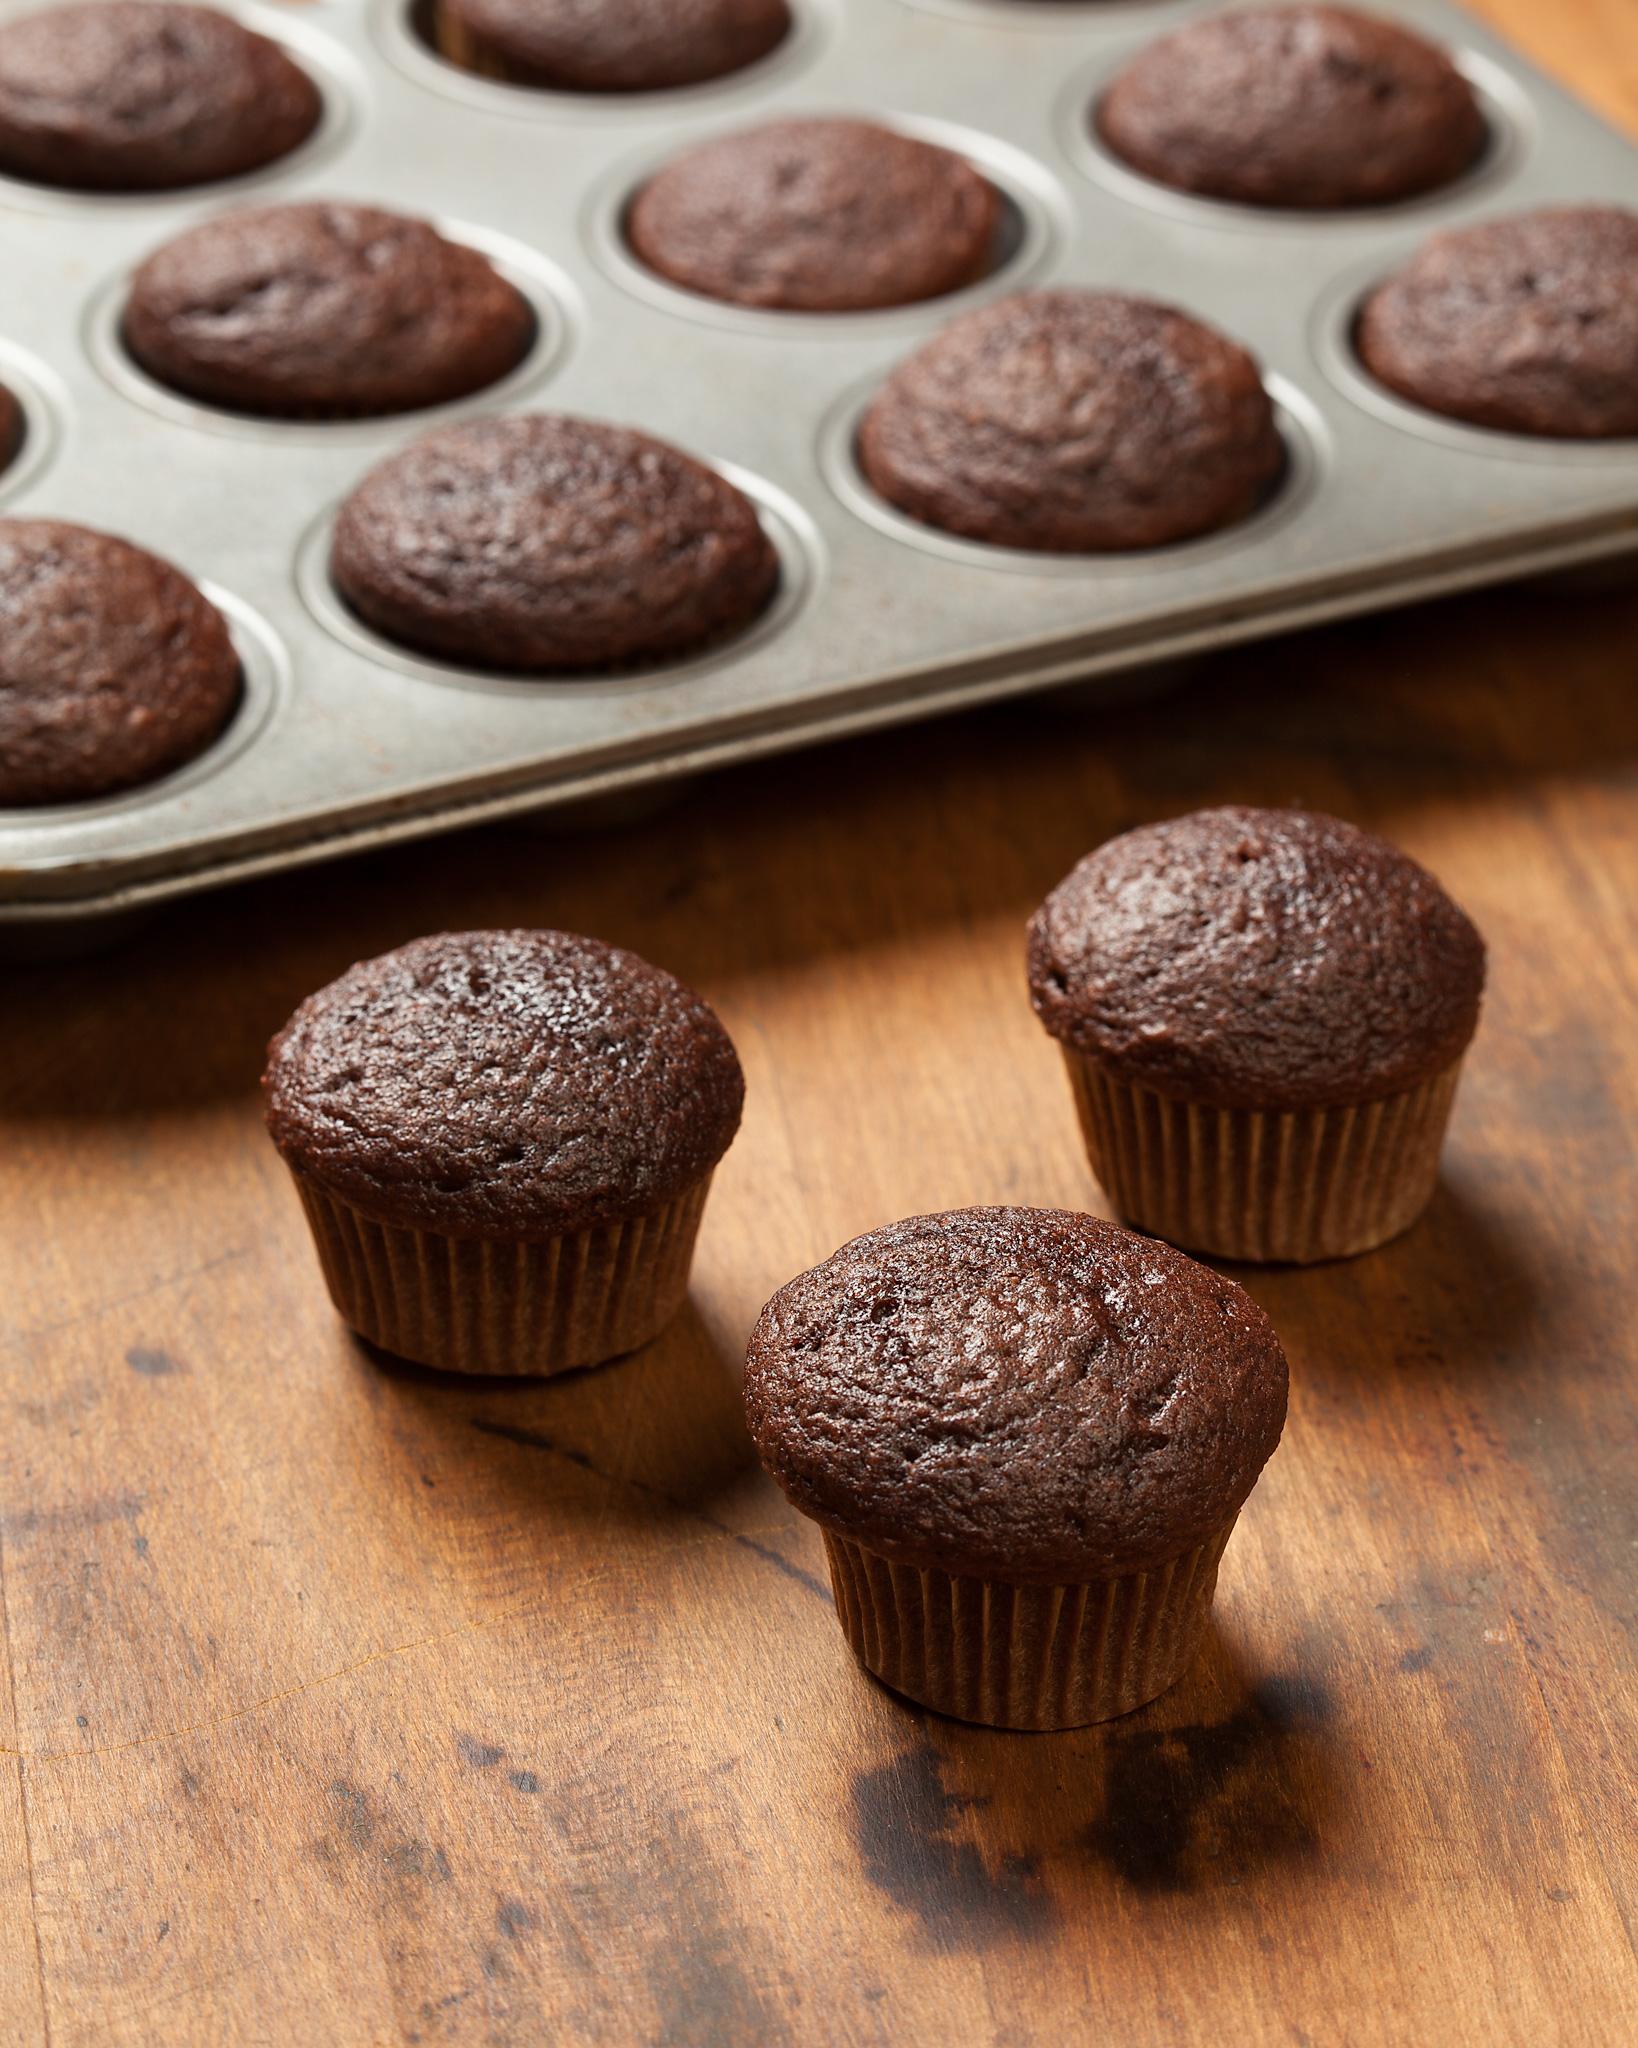 cupcakes-105-8x10